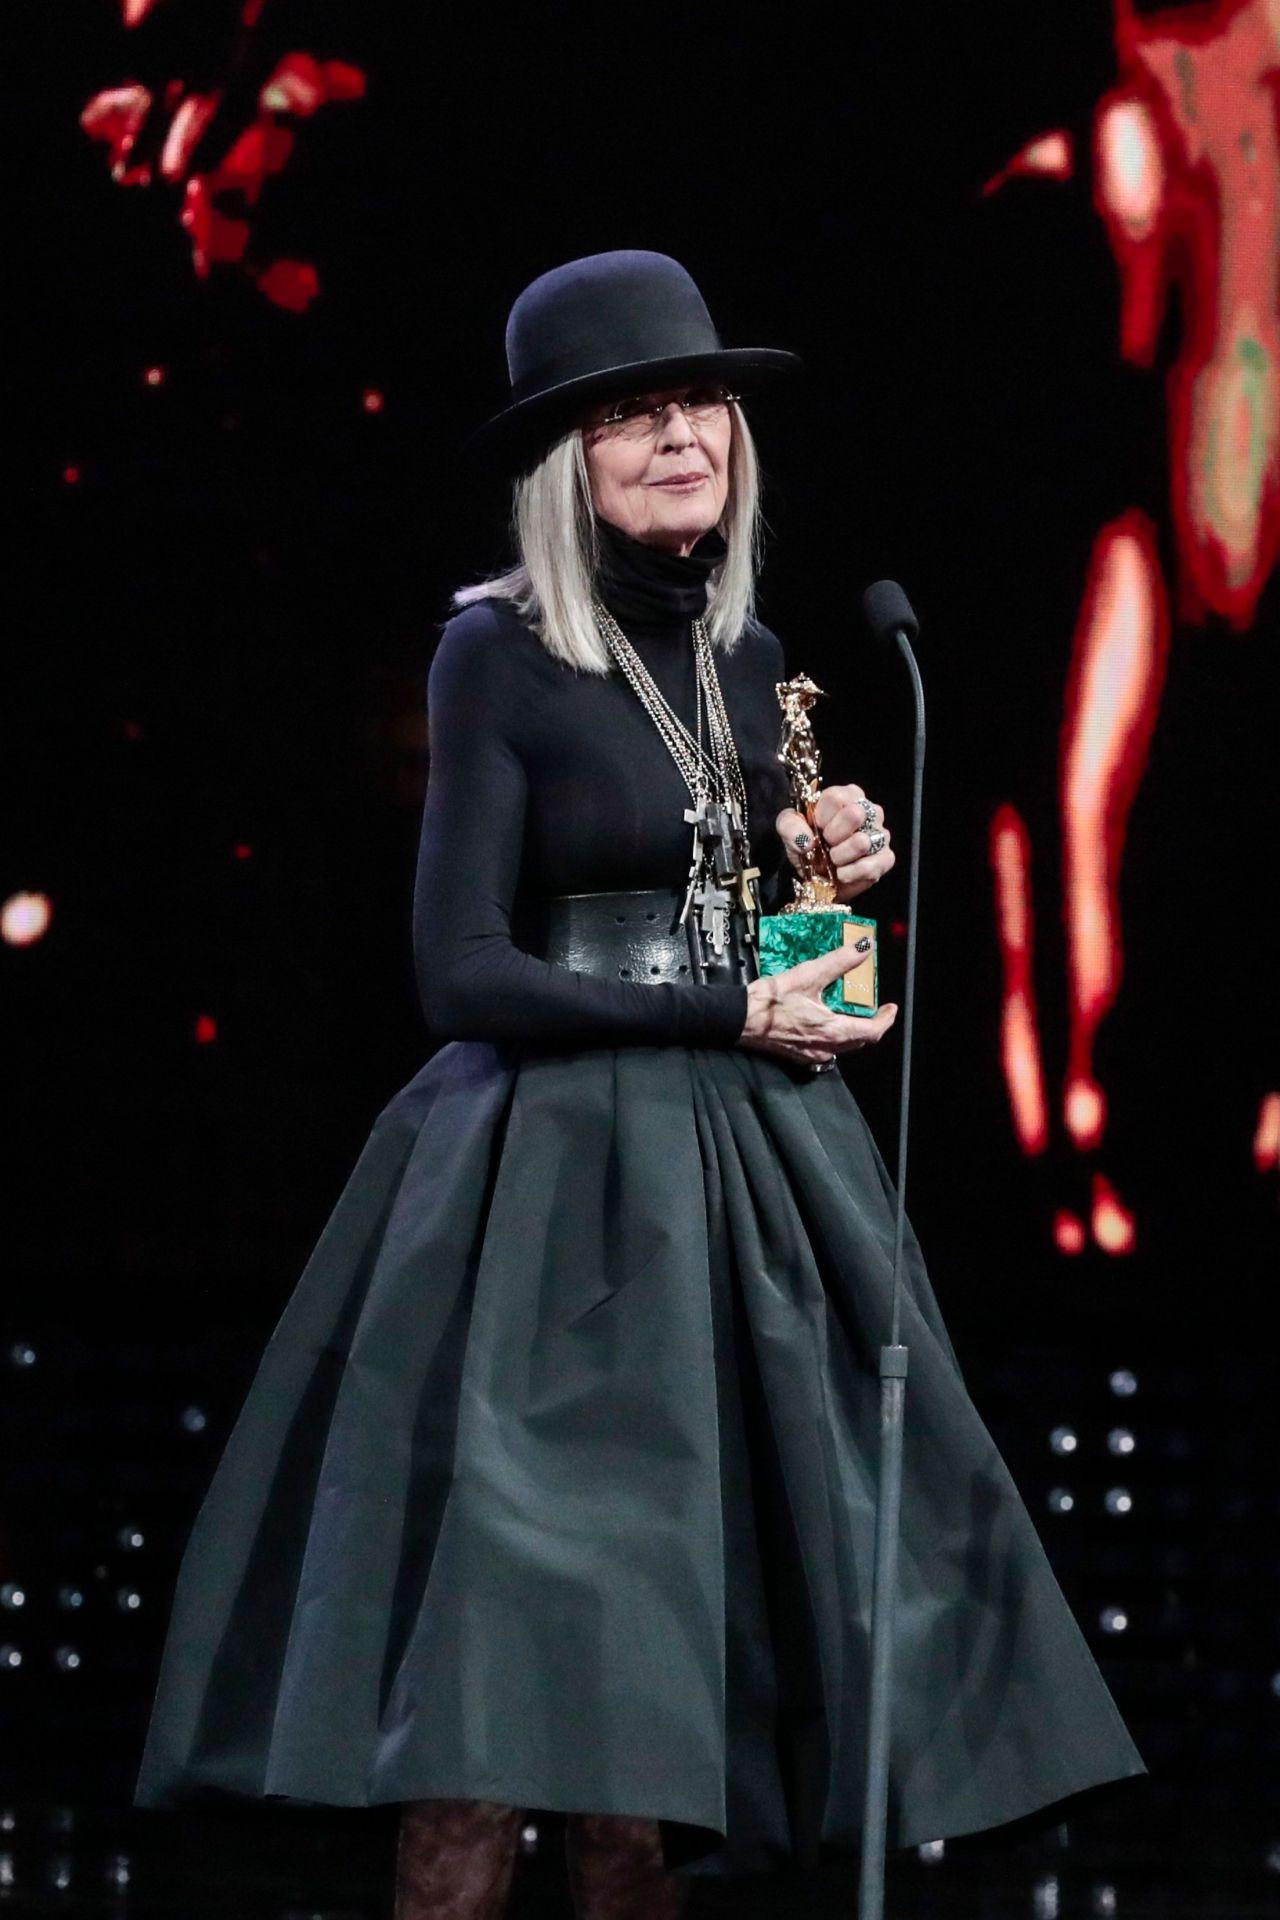 diane keaton  u2013 2018 david di donatello awards in rome